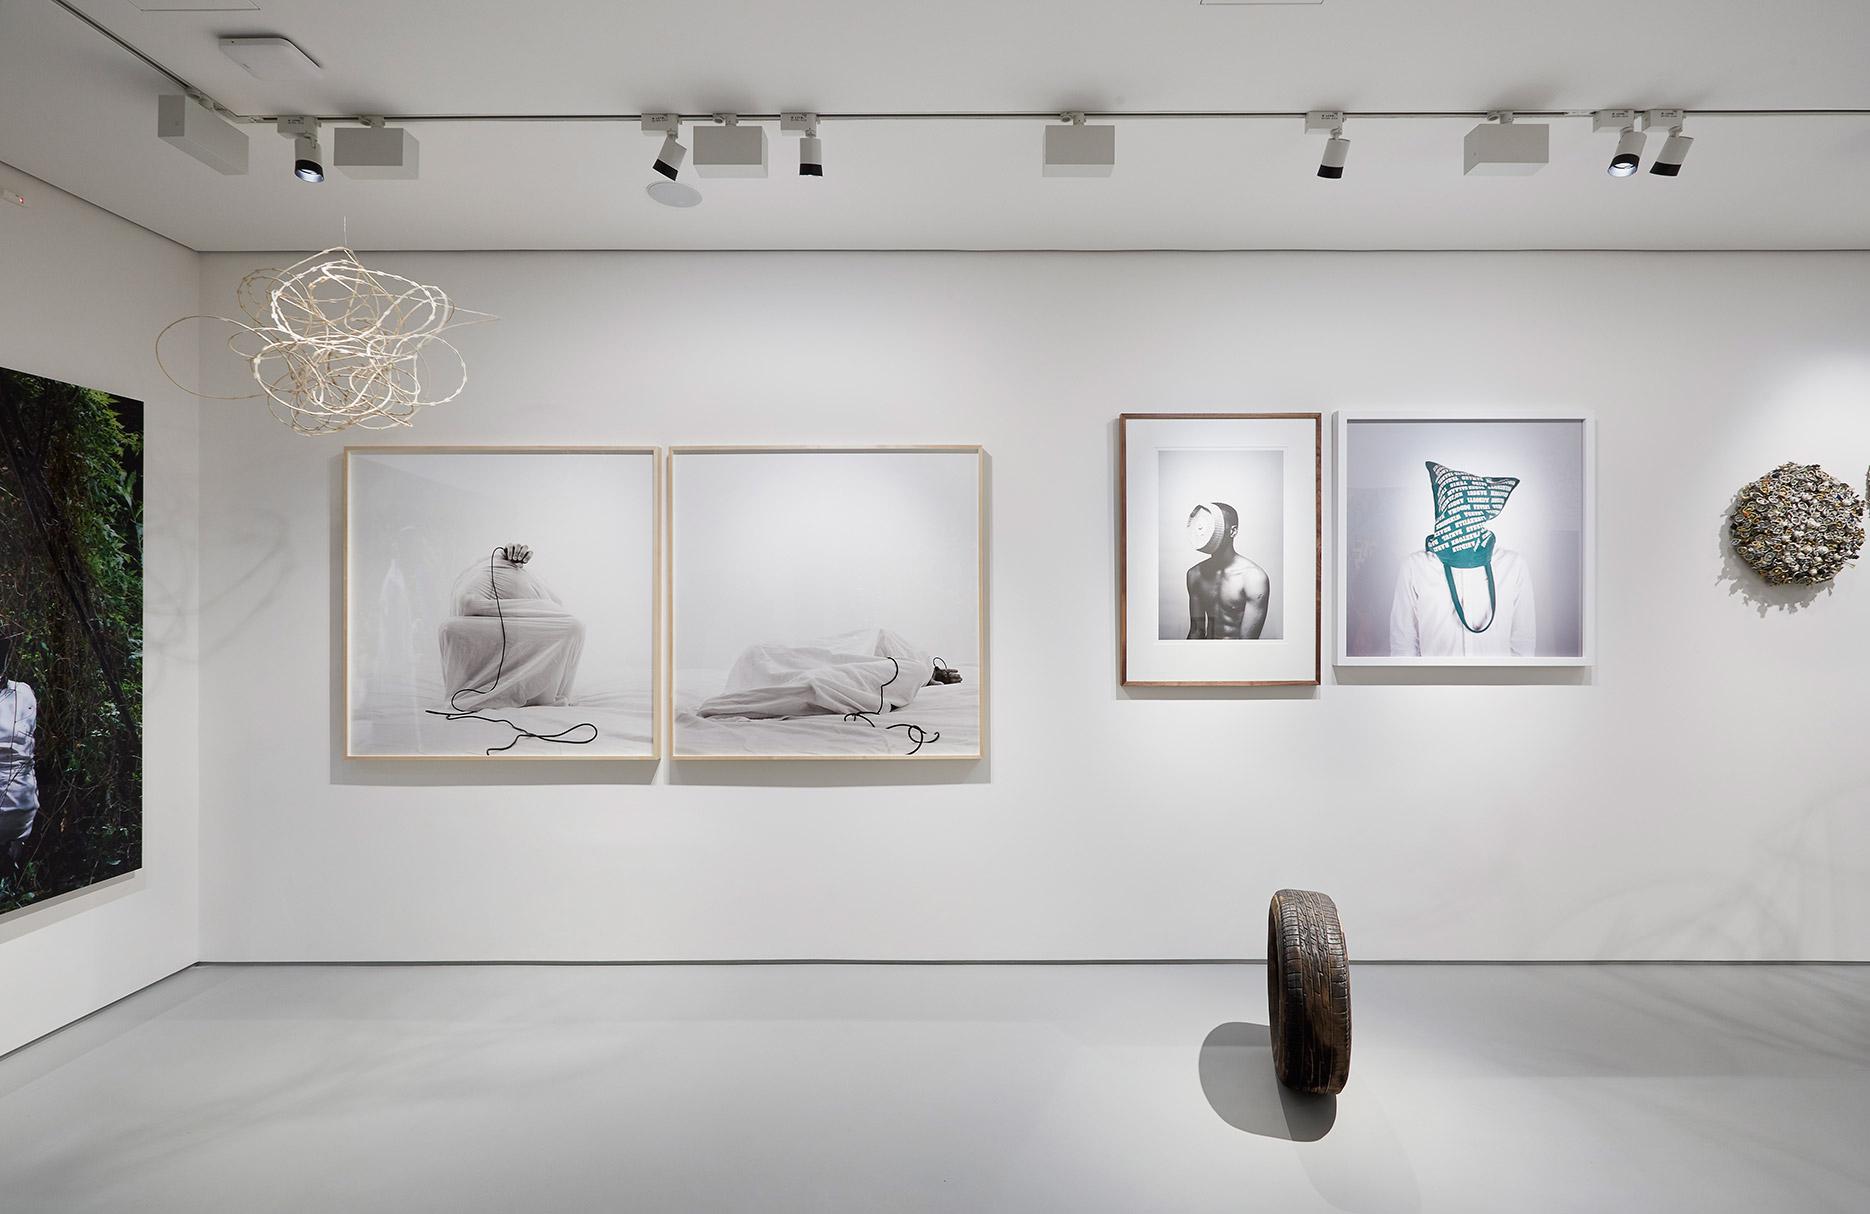 PJC-Light-Studio-Tyburn-Gallery-04W.jpg